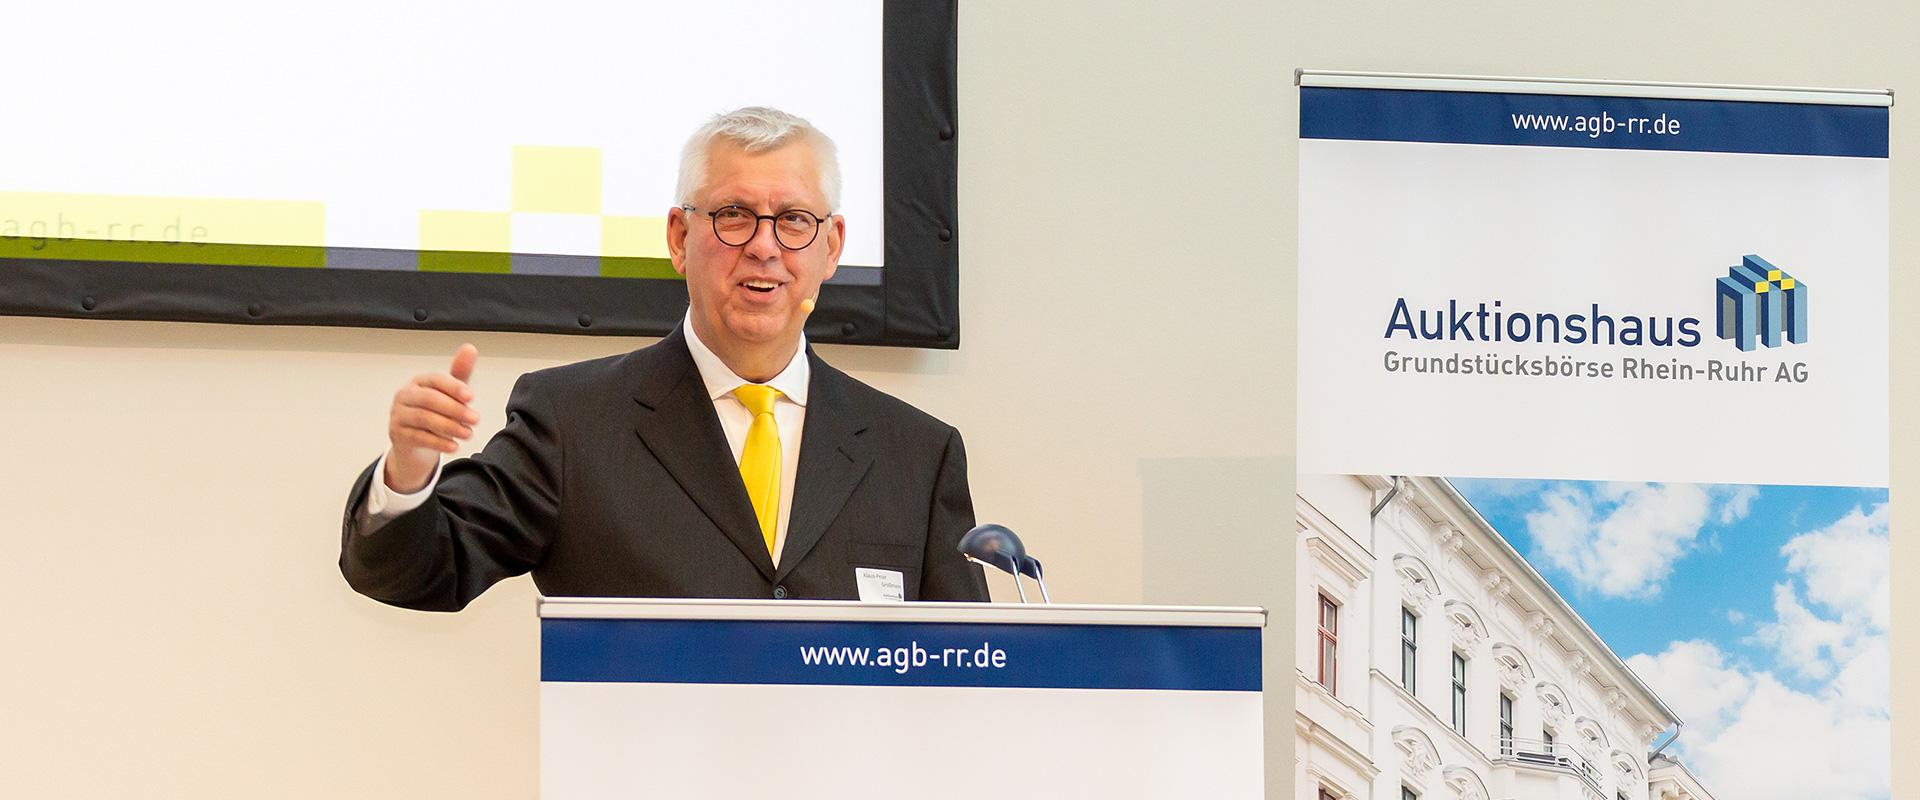 Immobilien-Auktion: Auktionator Klaus-Peter Großmann